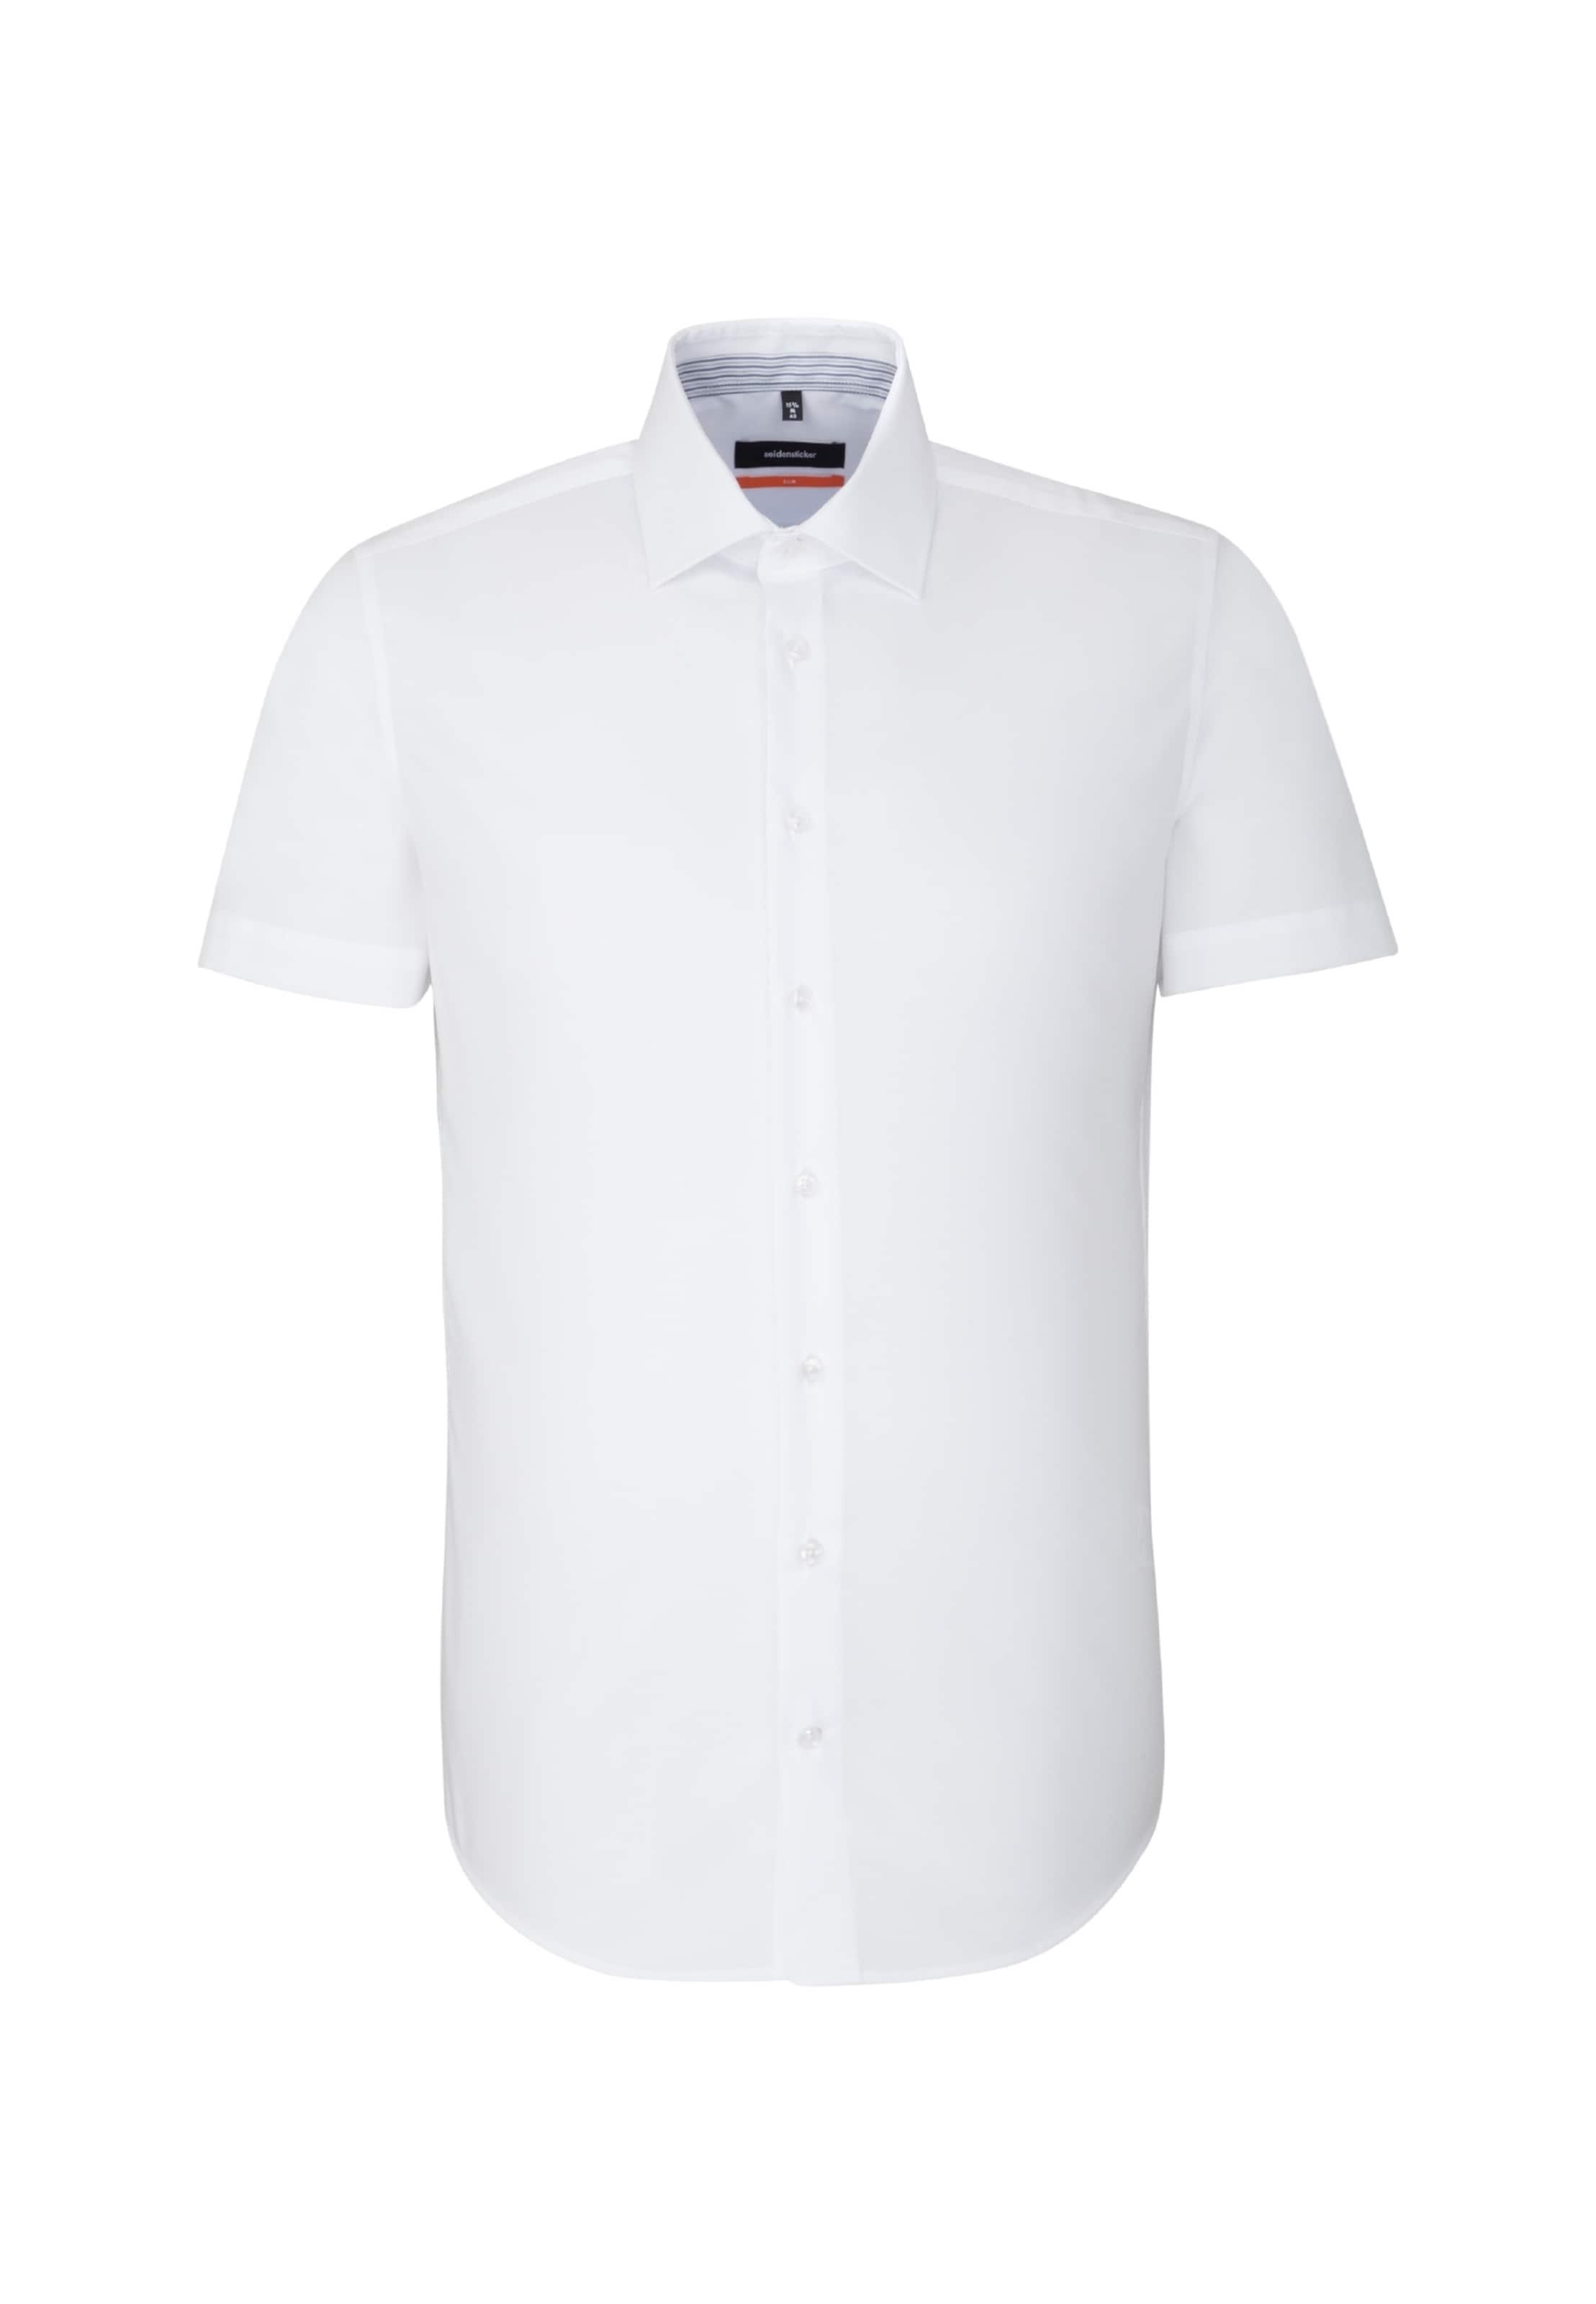 Seidensticker Seidensticker Weiß In In In Hemd 'slim' Hemd 'slim' 'slim' Hemd Seidensticker Weiß oCxBWdre